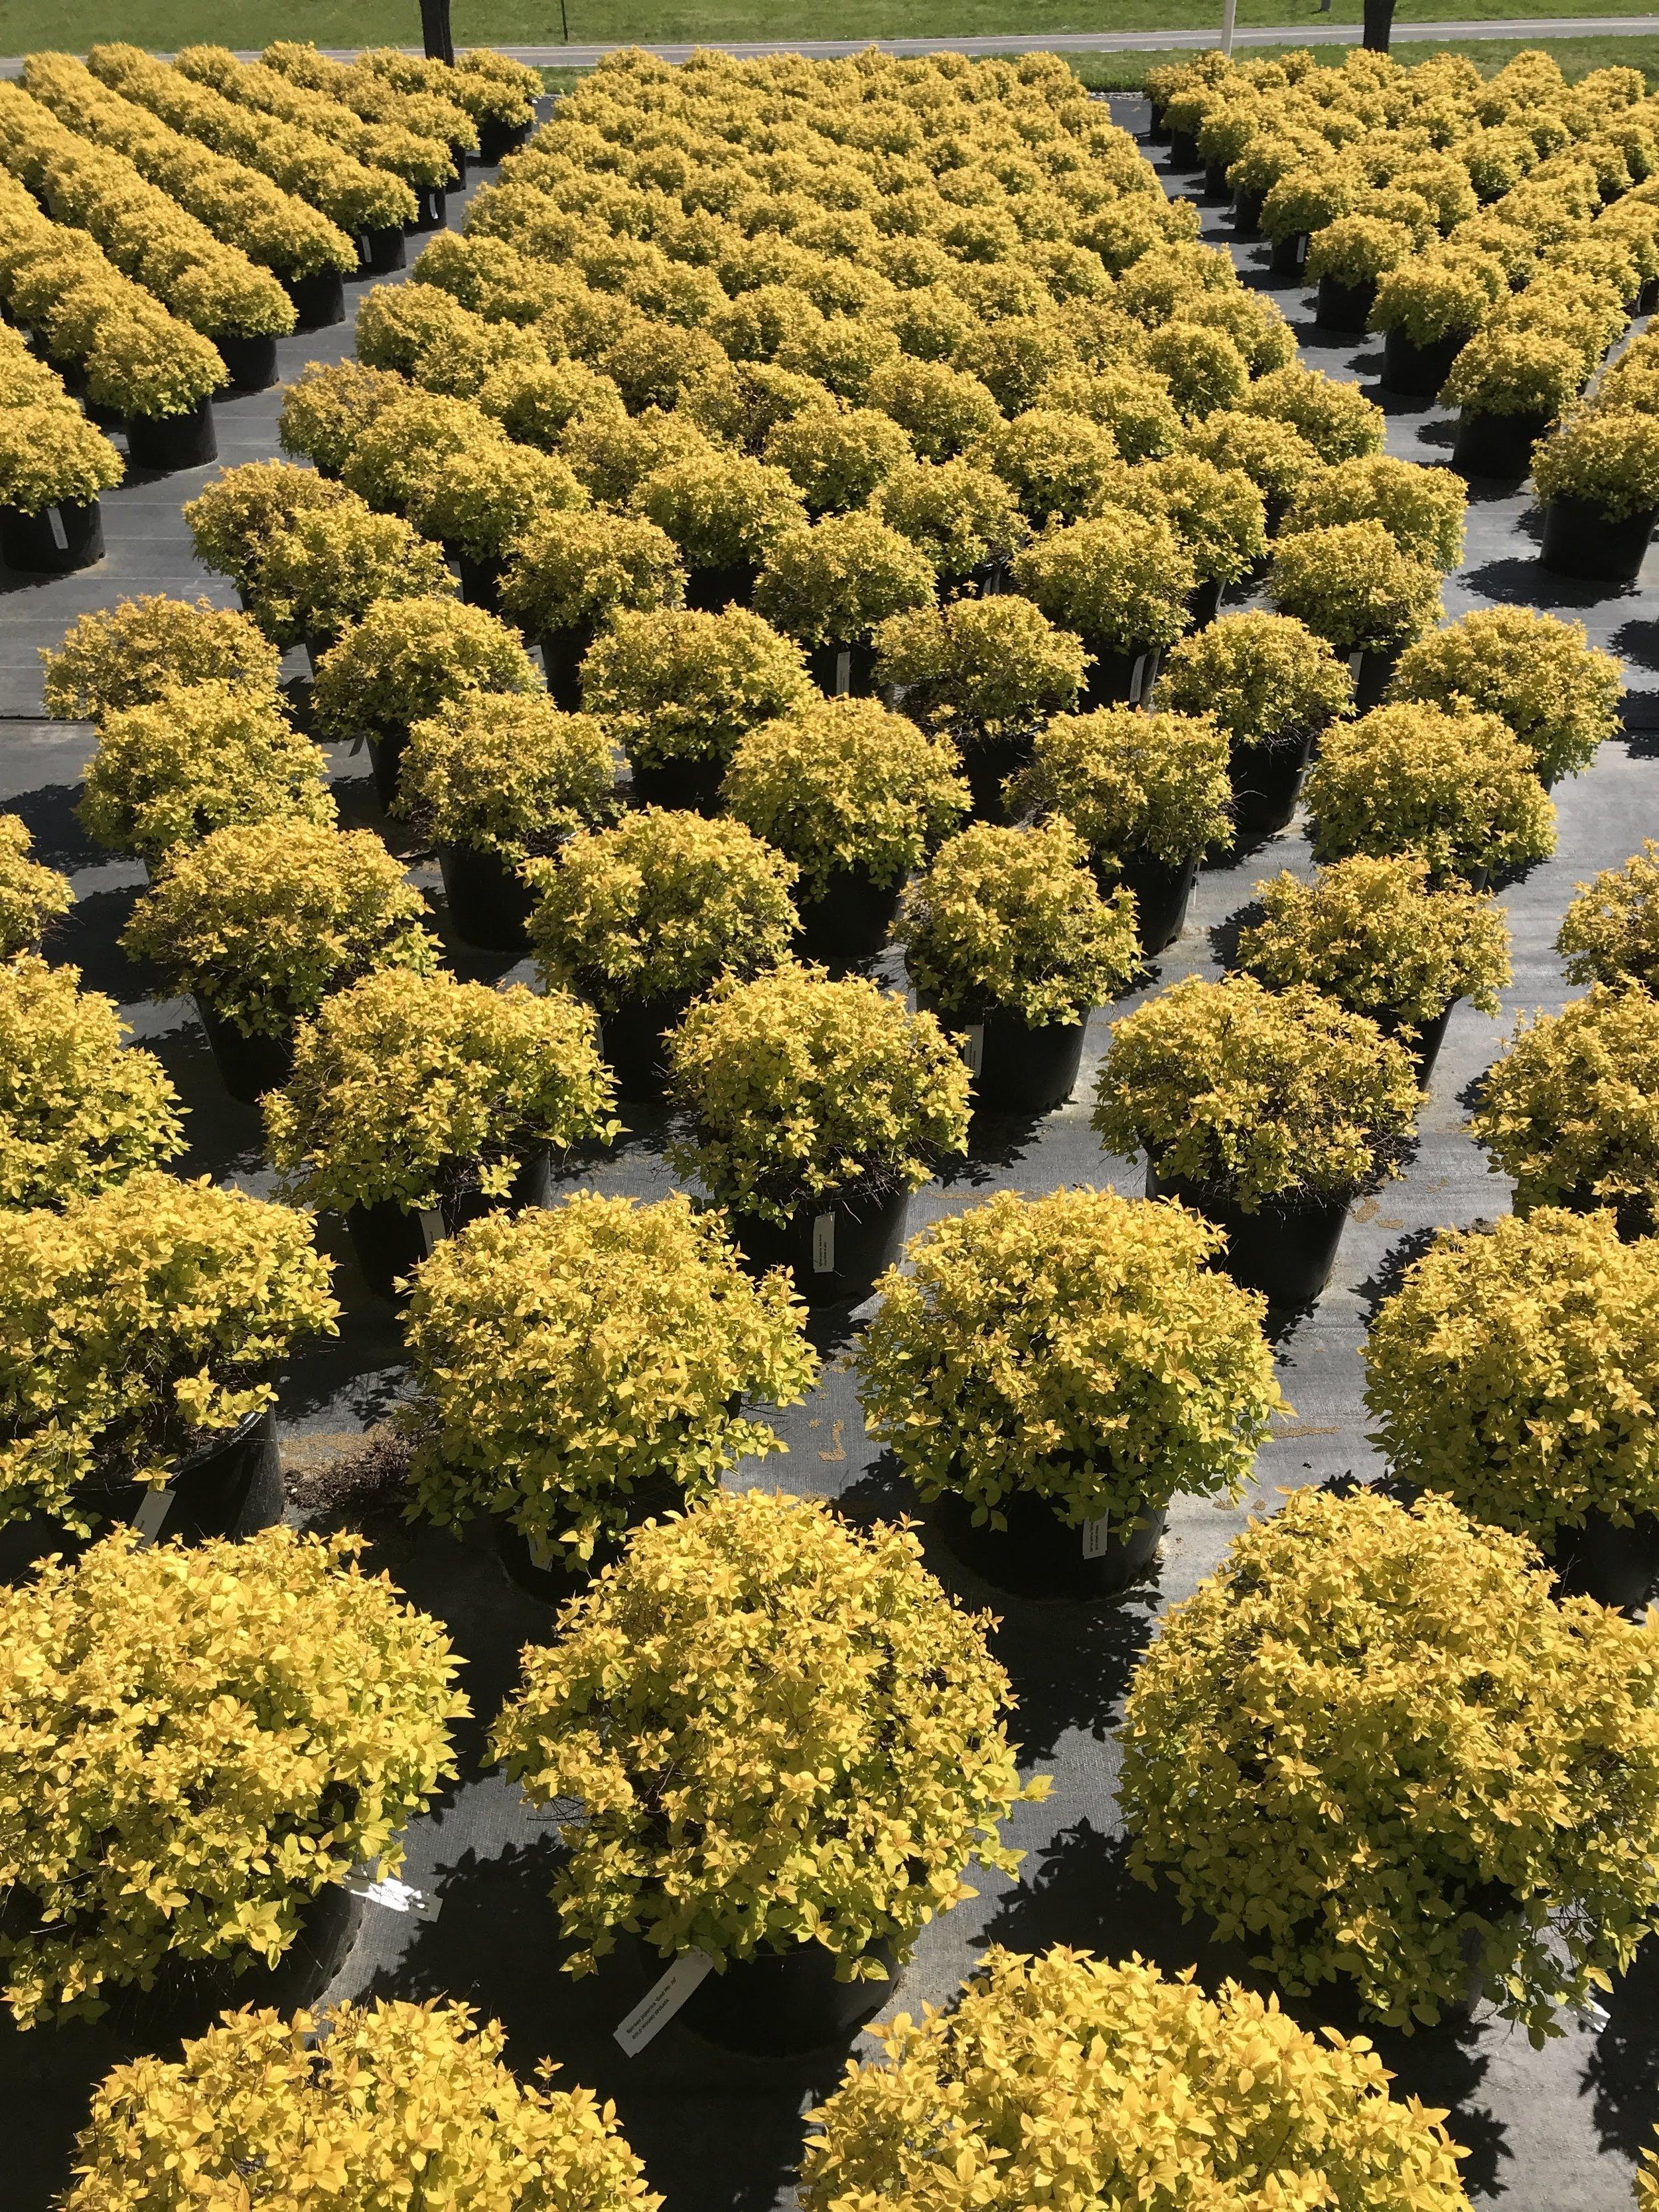 Spiraea japonica 'Gold Mound' 3 gallon